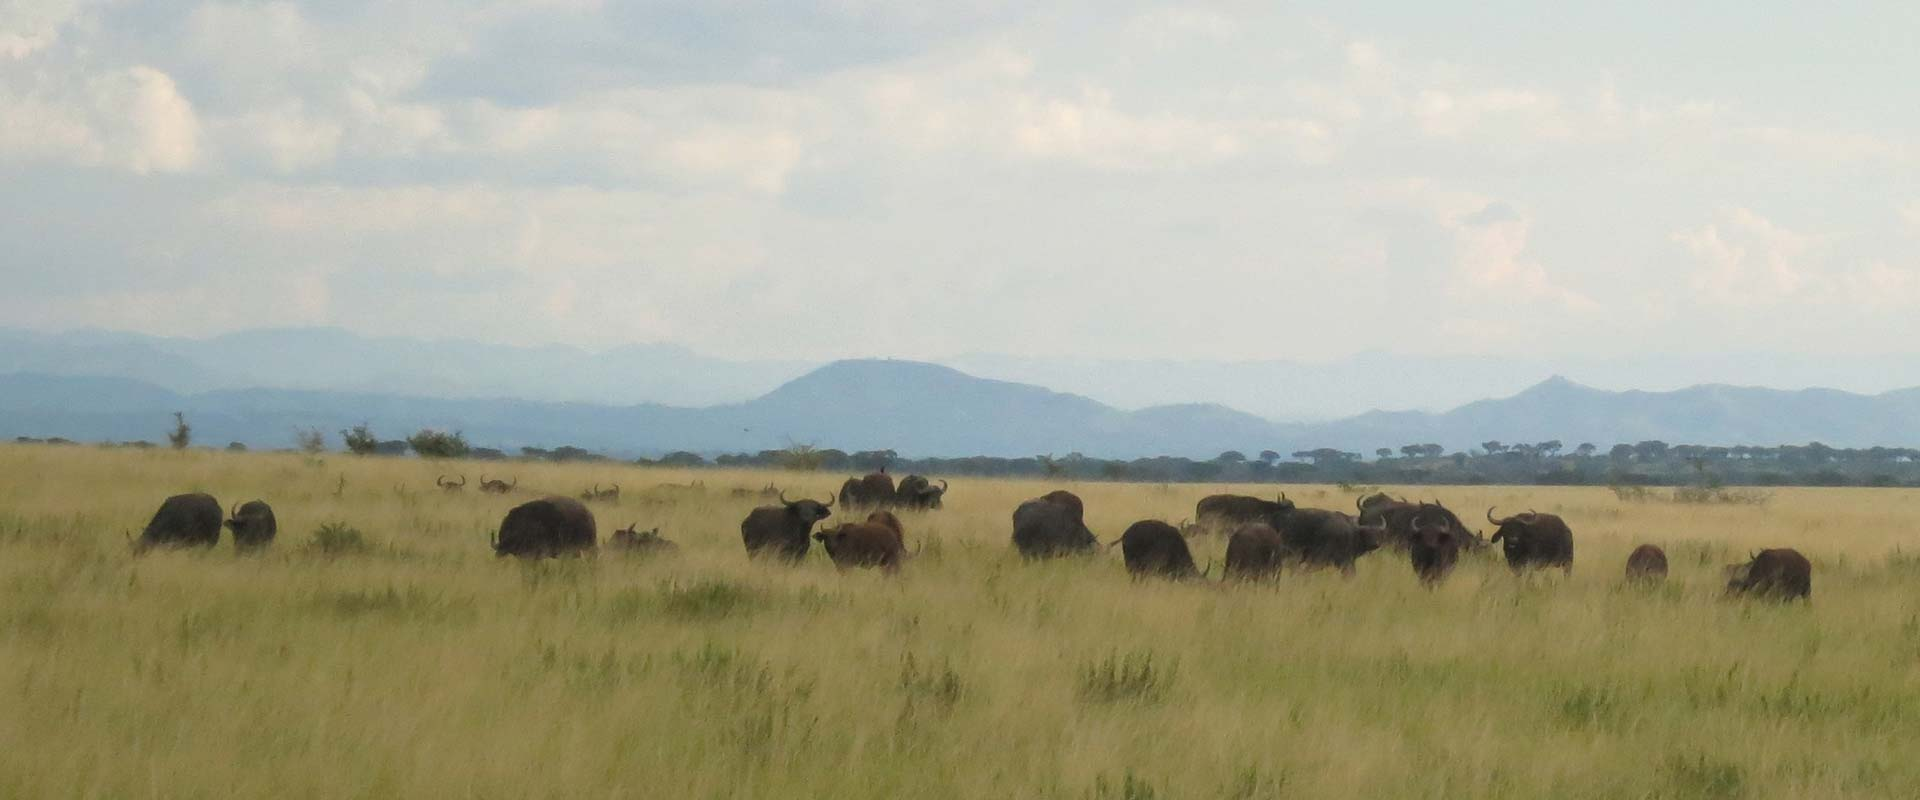 Queen elizabeth National Park landscape view of Rwenzori backdrop